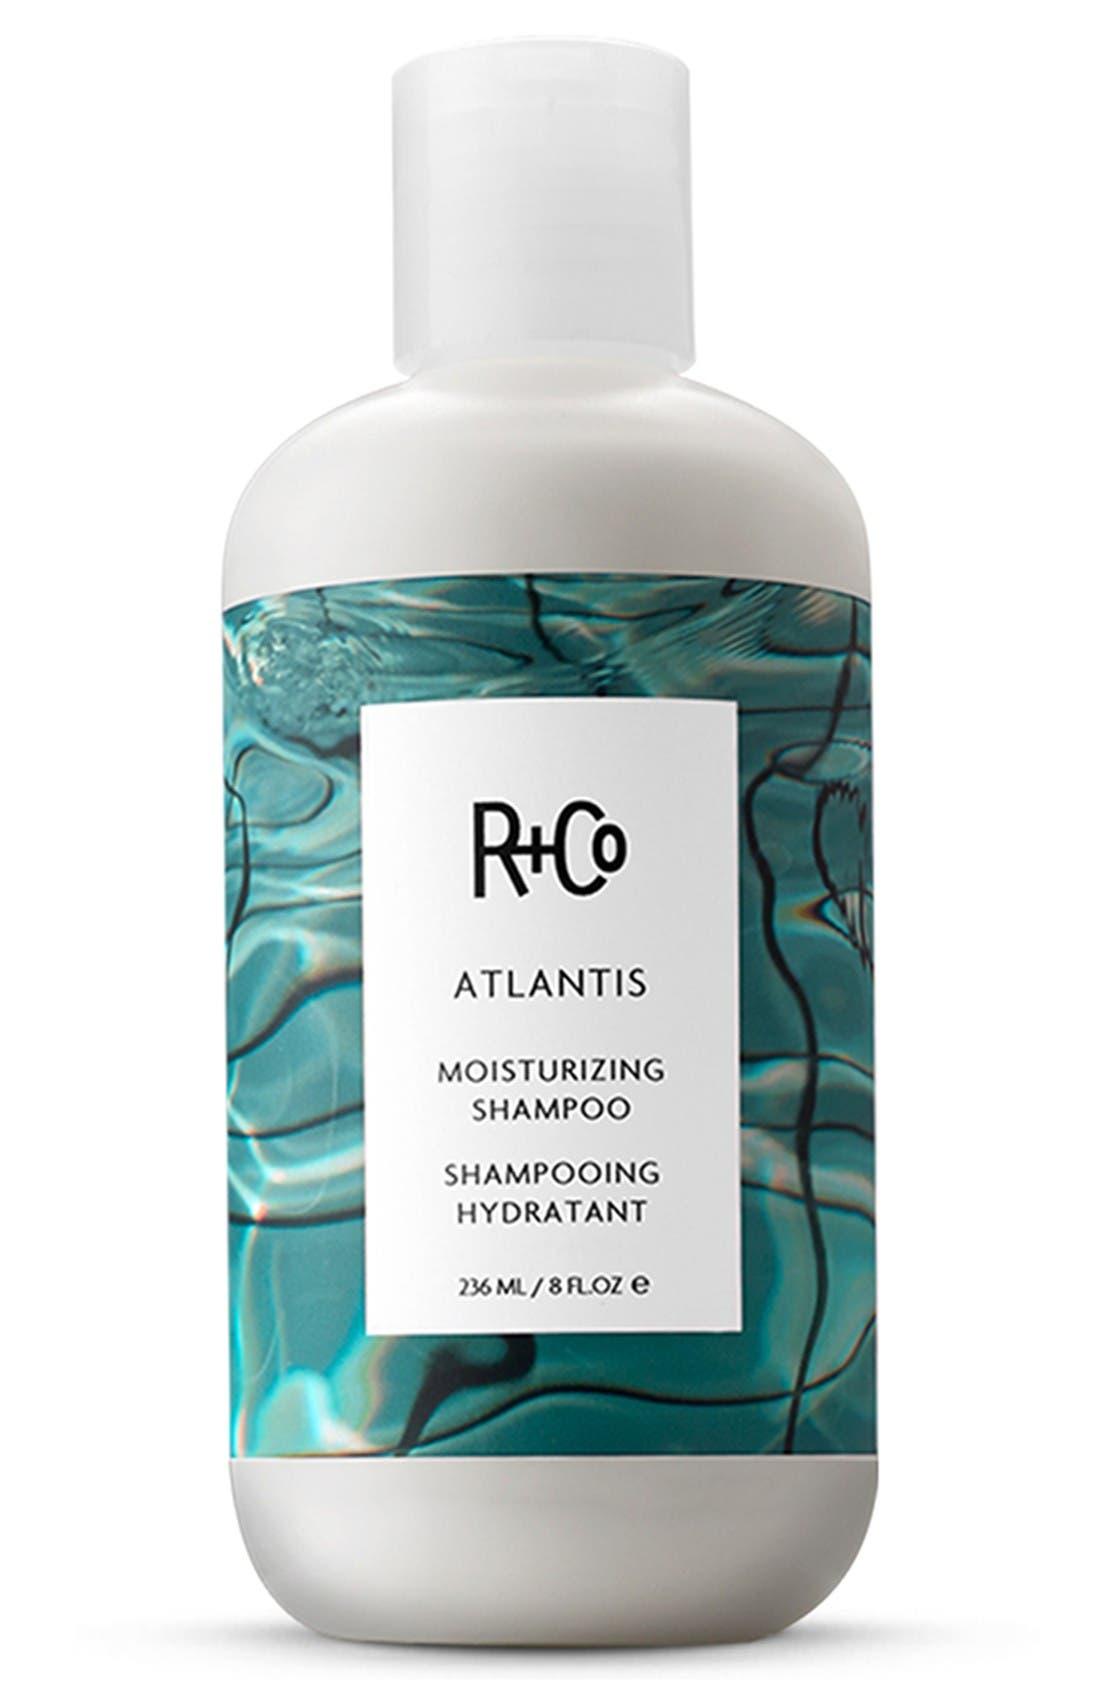 Main Image - SPACE.NK.apothecary R+Co Atlantis Moisturizing Shampoo